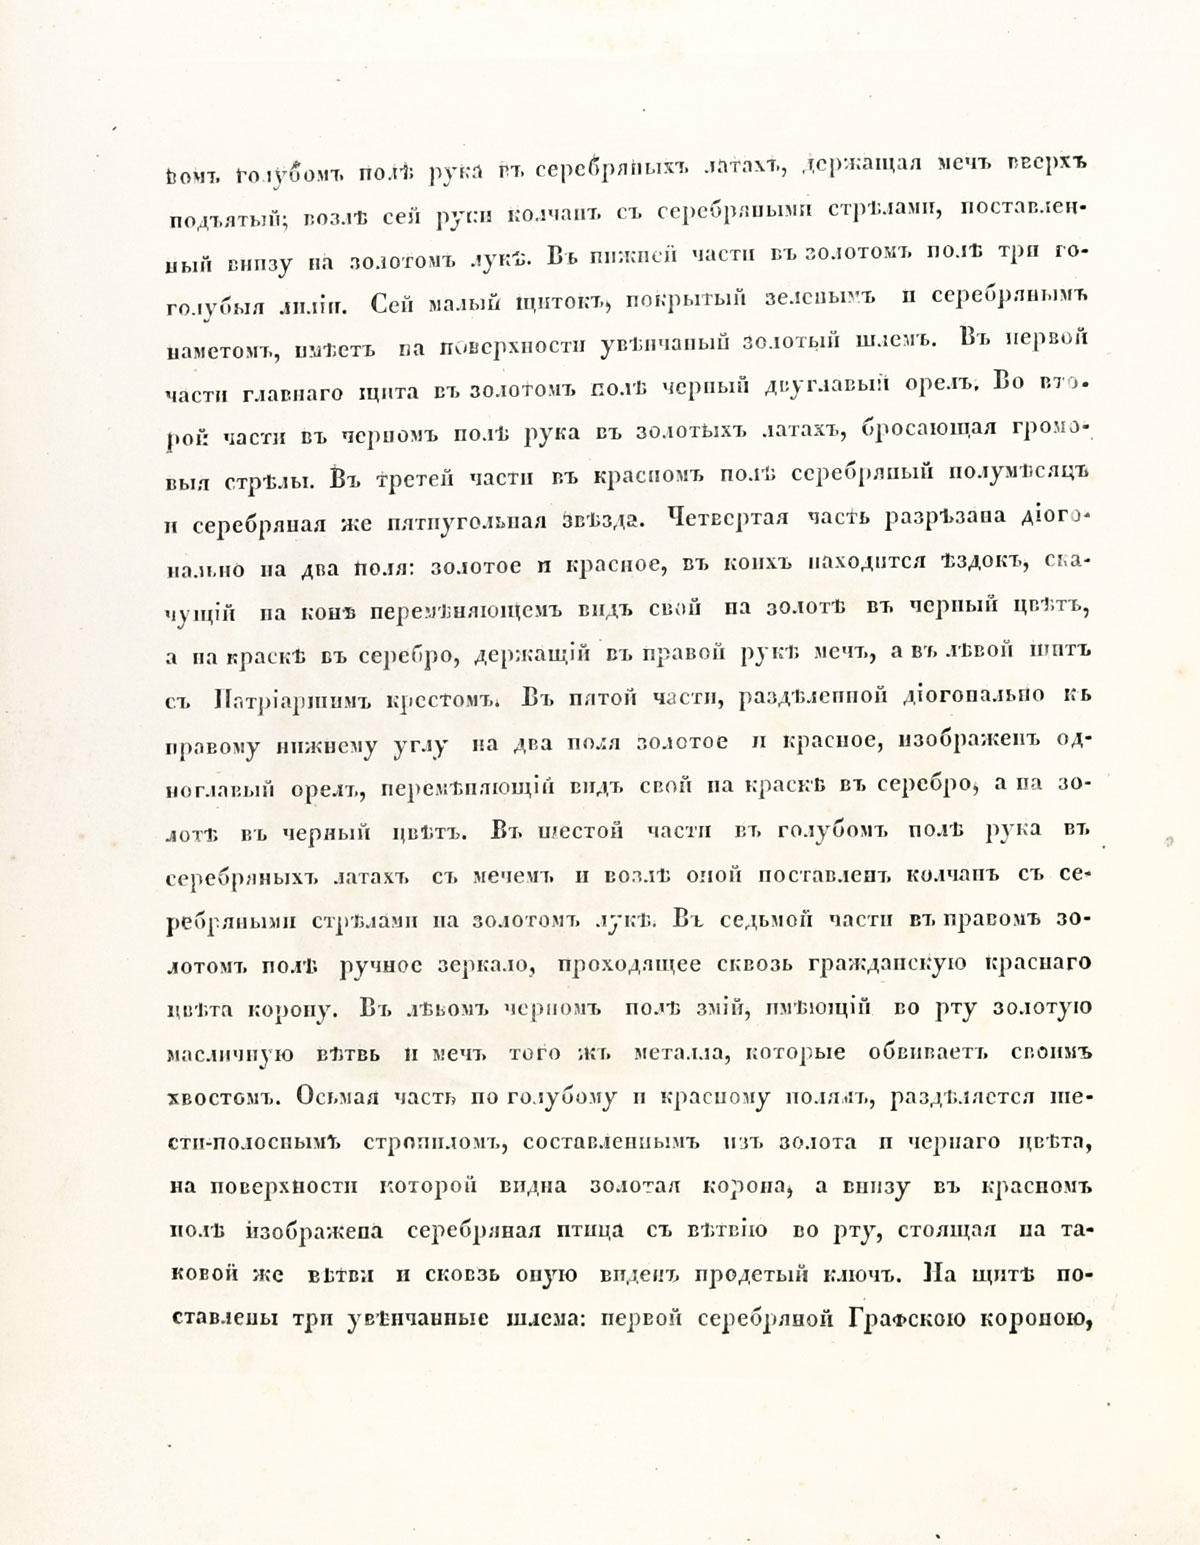 Герб Римской Империи князя Зубова, стр. 2